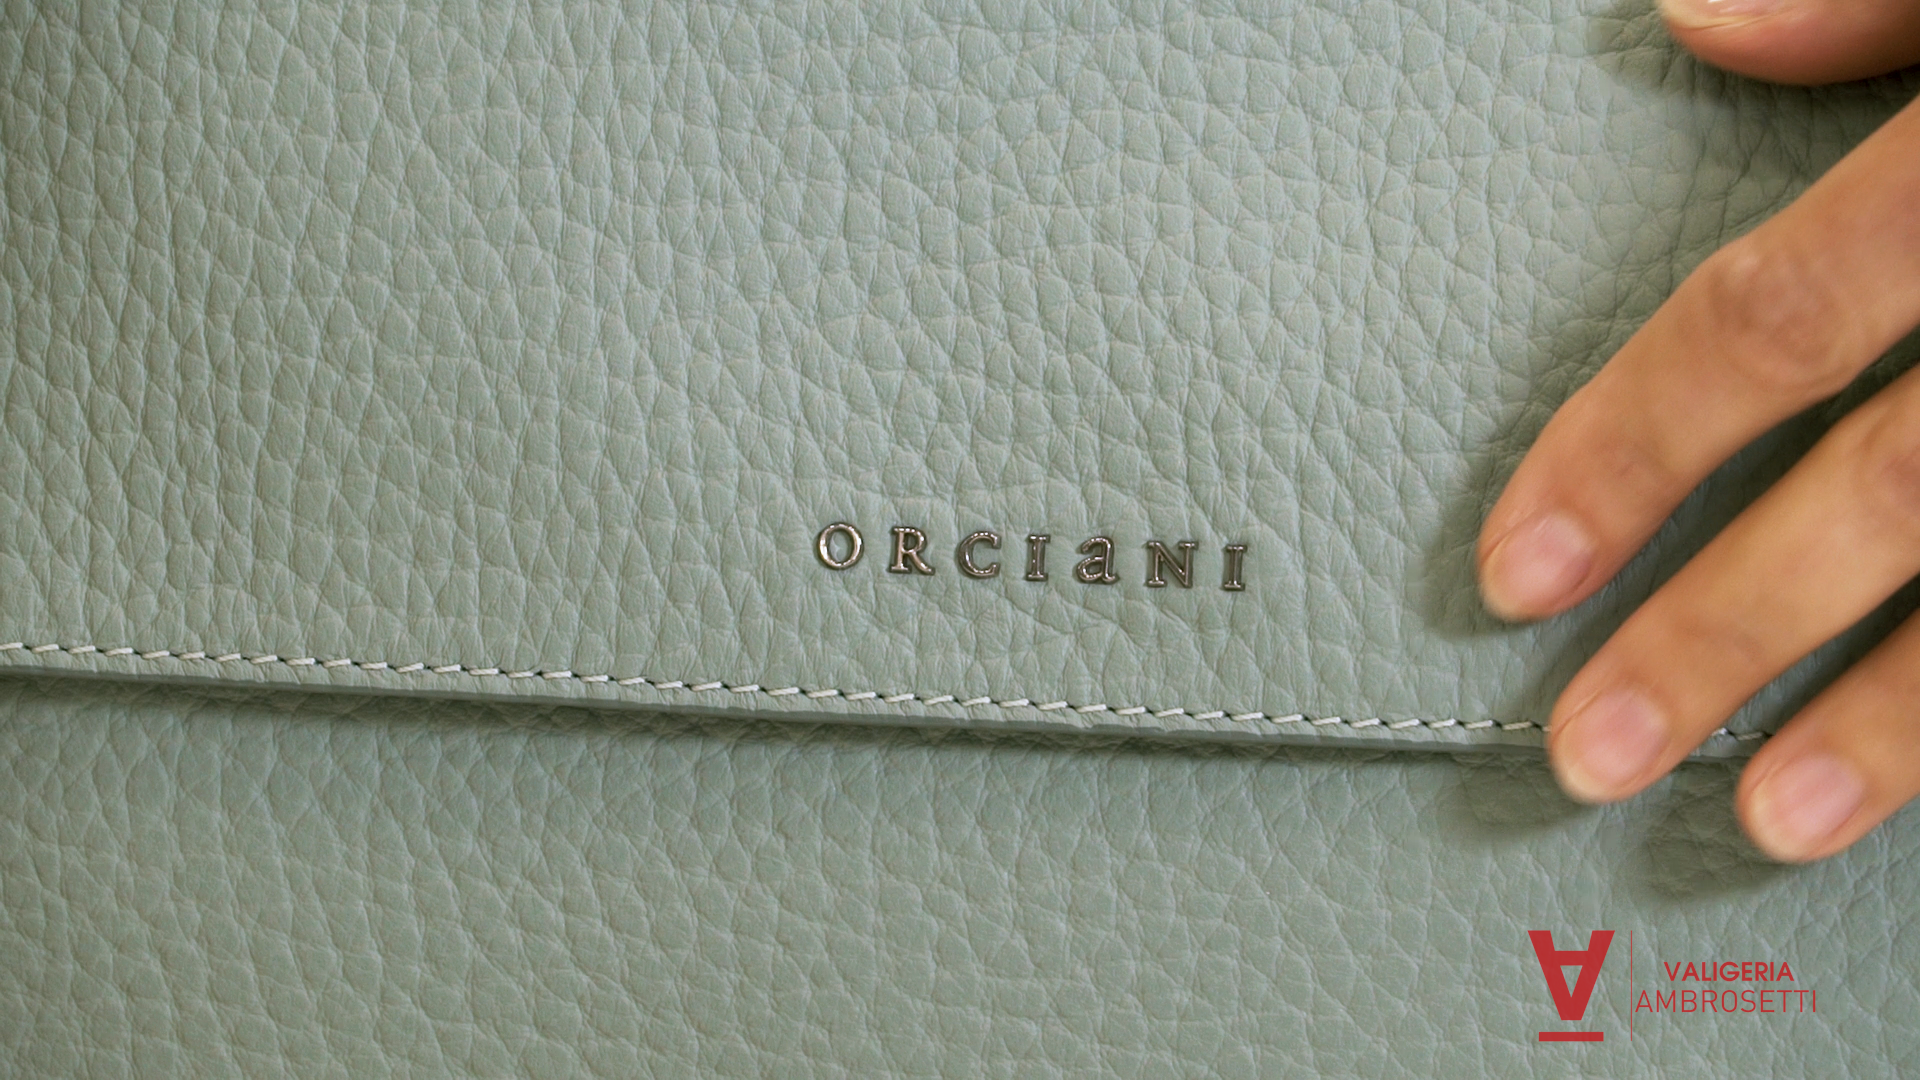 sveva orciani originale-valigeria-ambrosetti